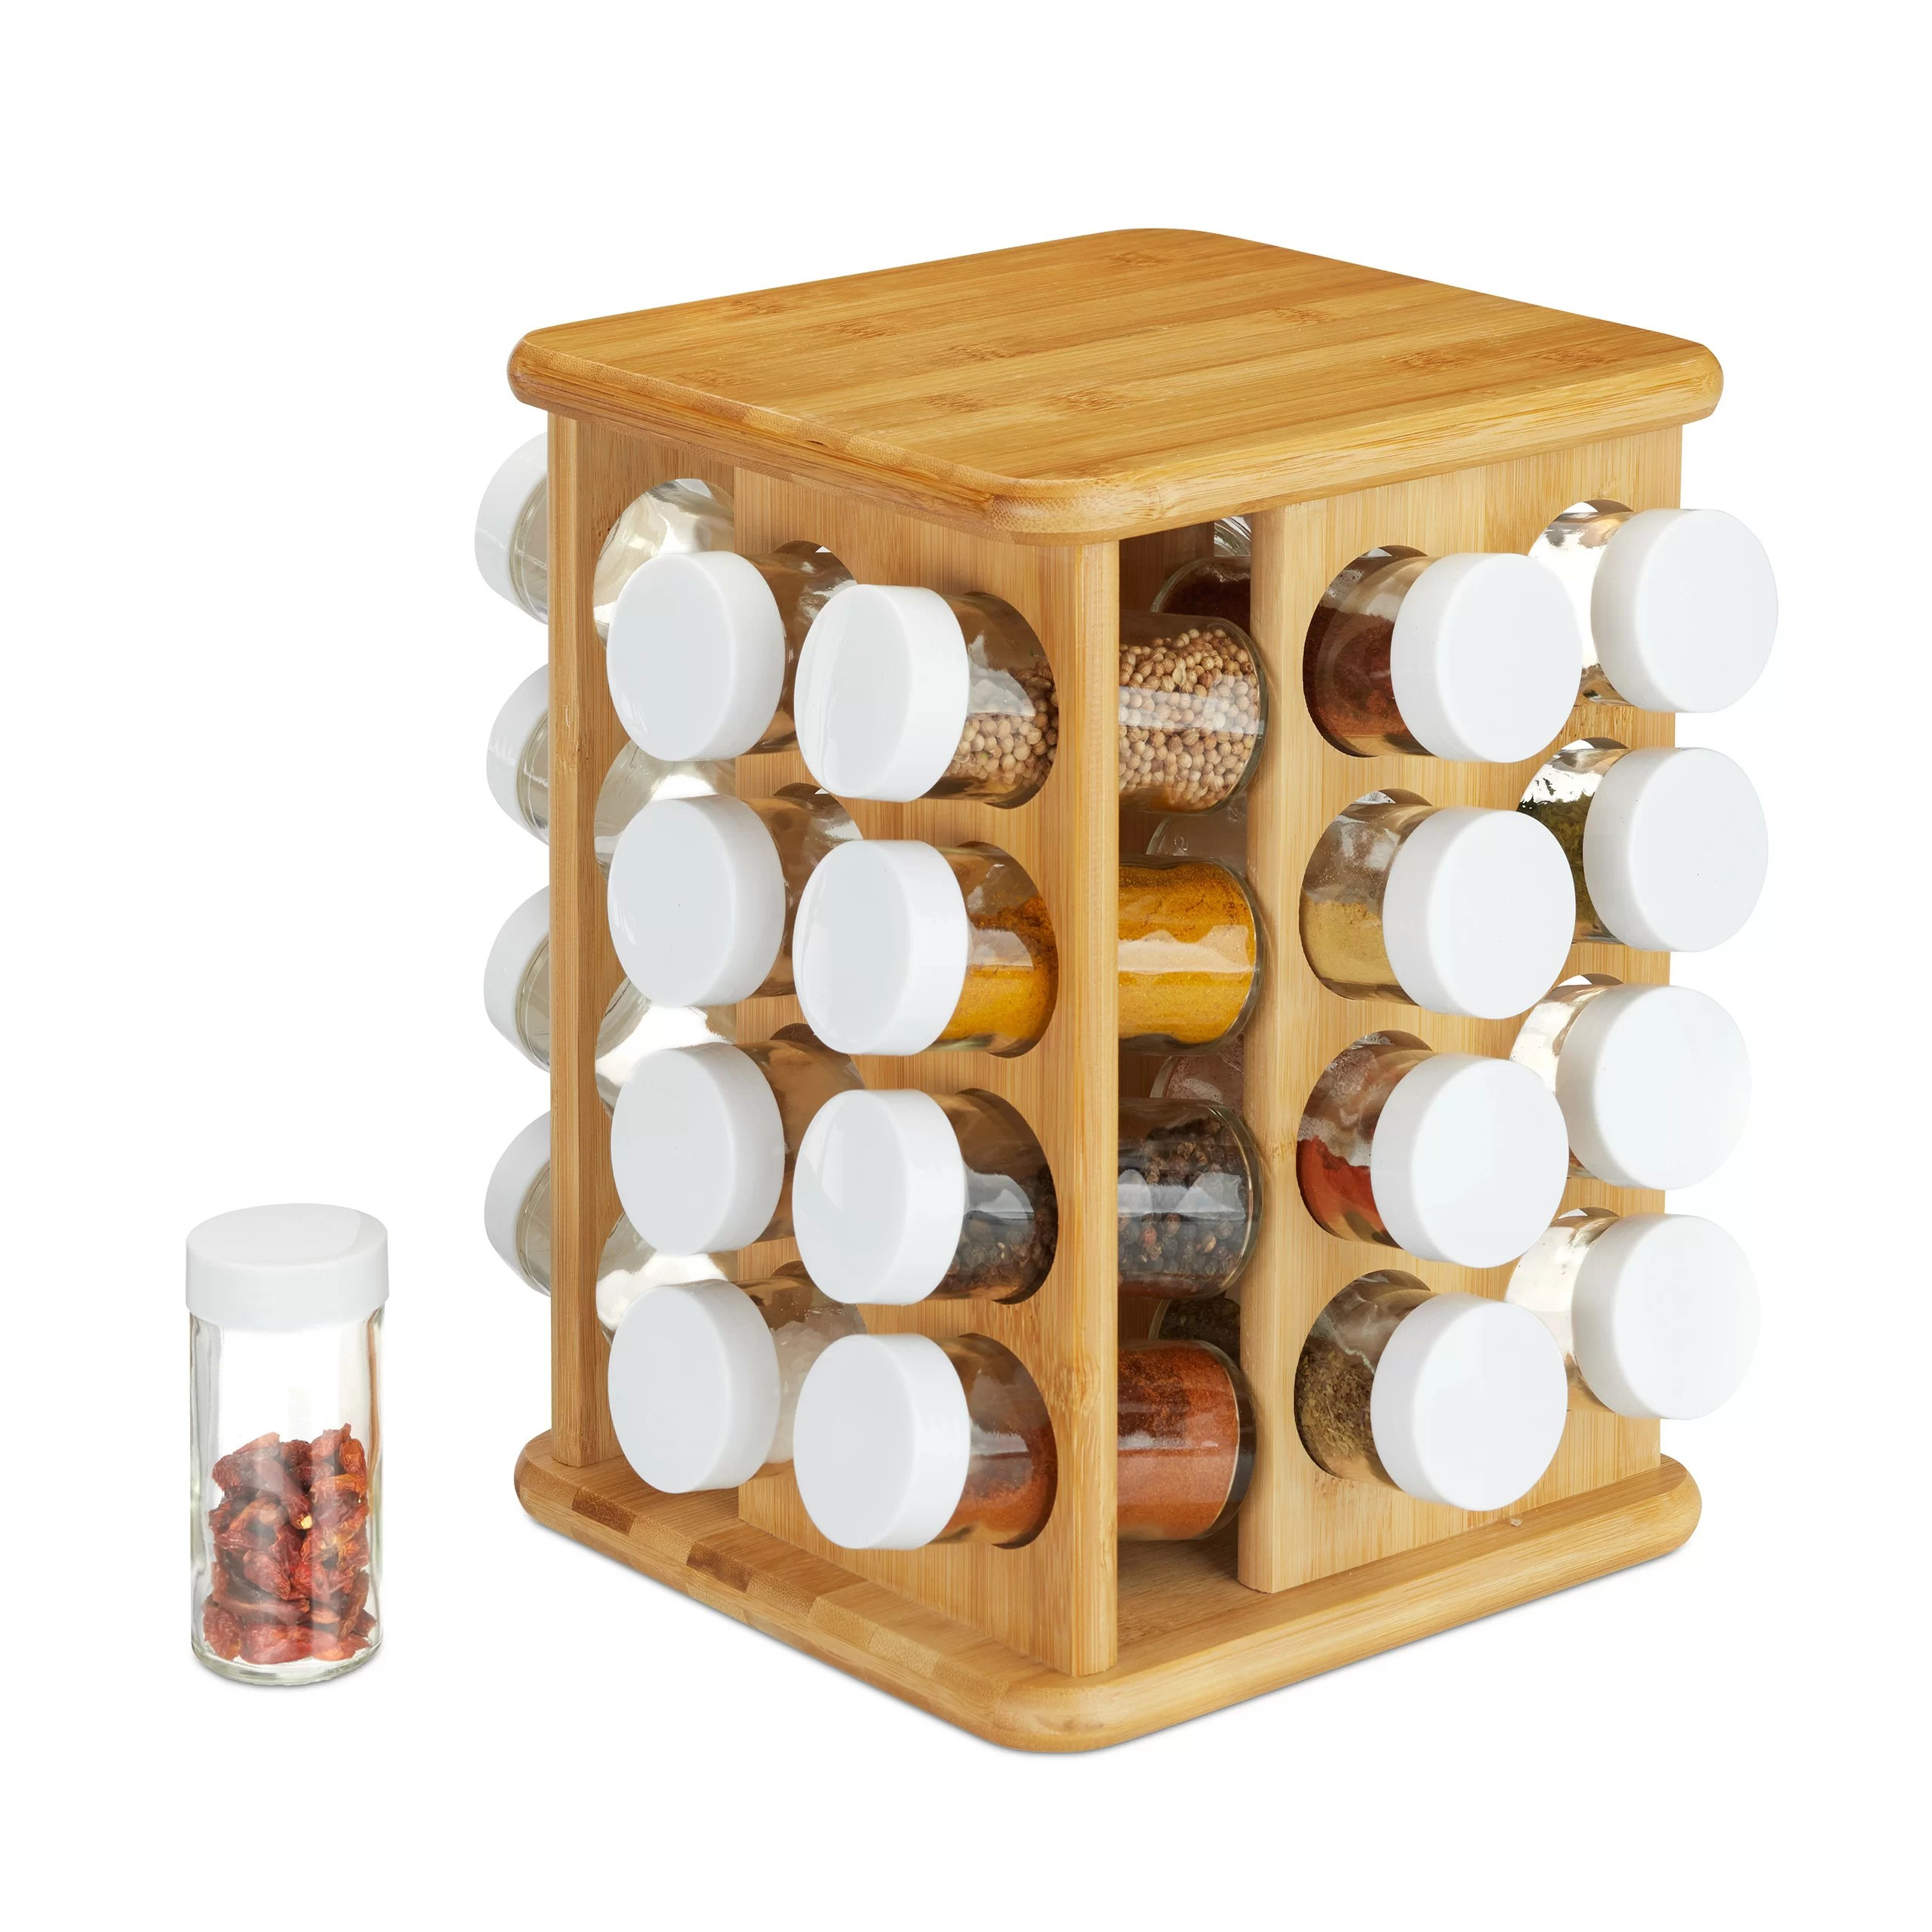 32 jar free standing spice rack